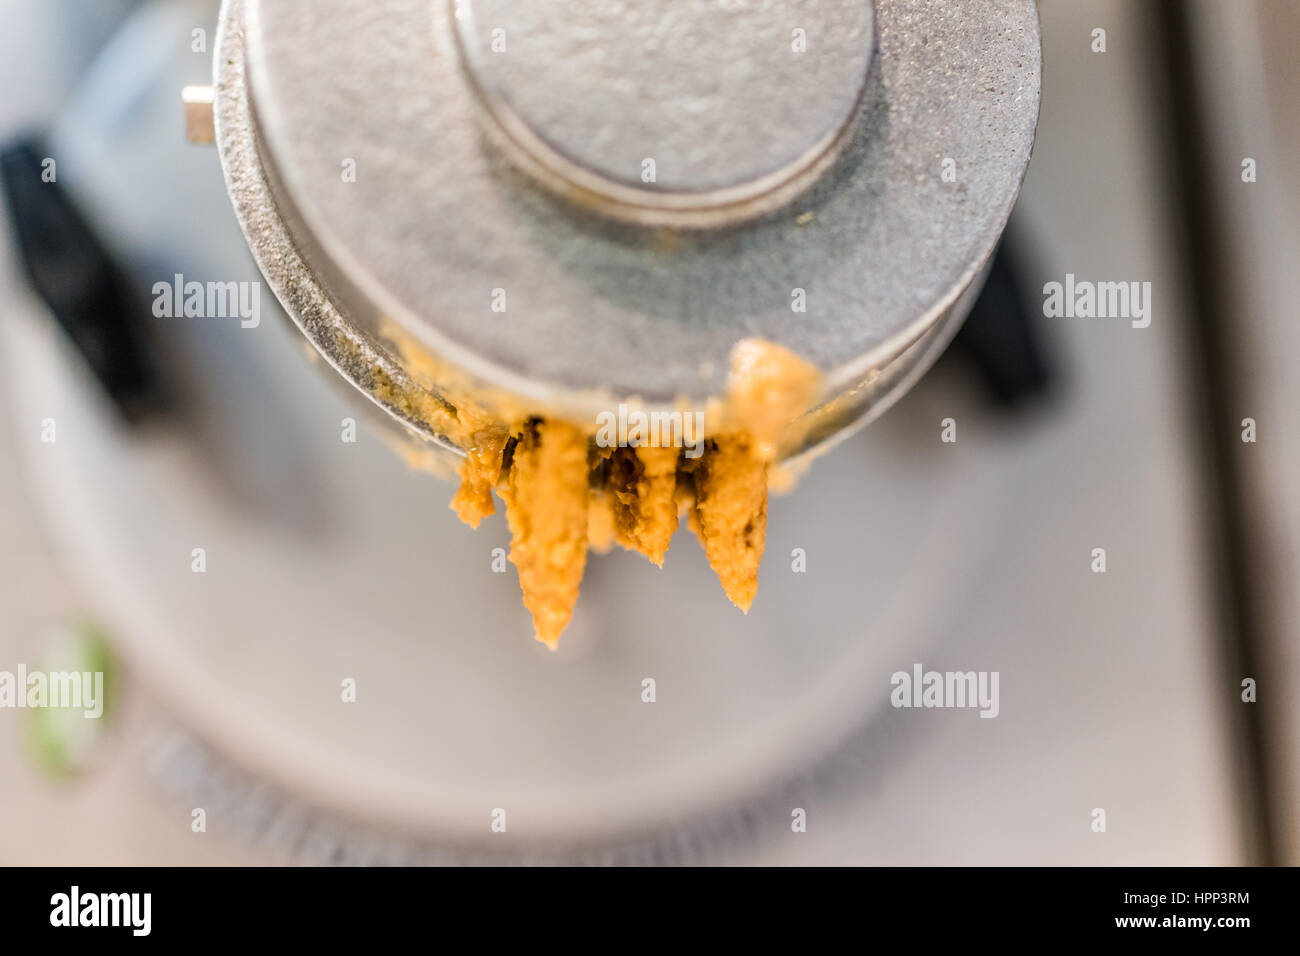 Leftover peanut butter on machine grinder Stock Photo